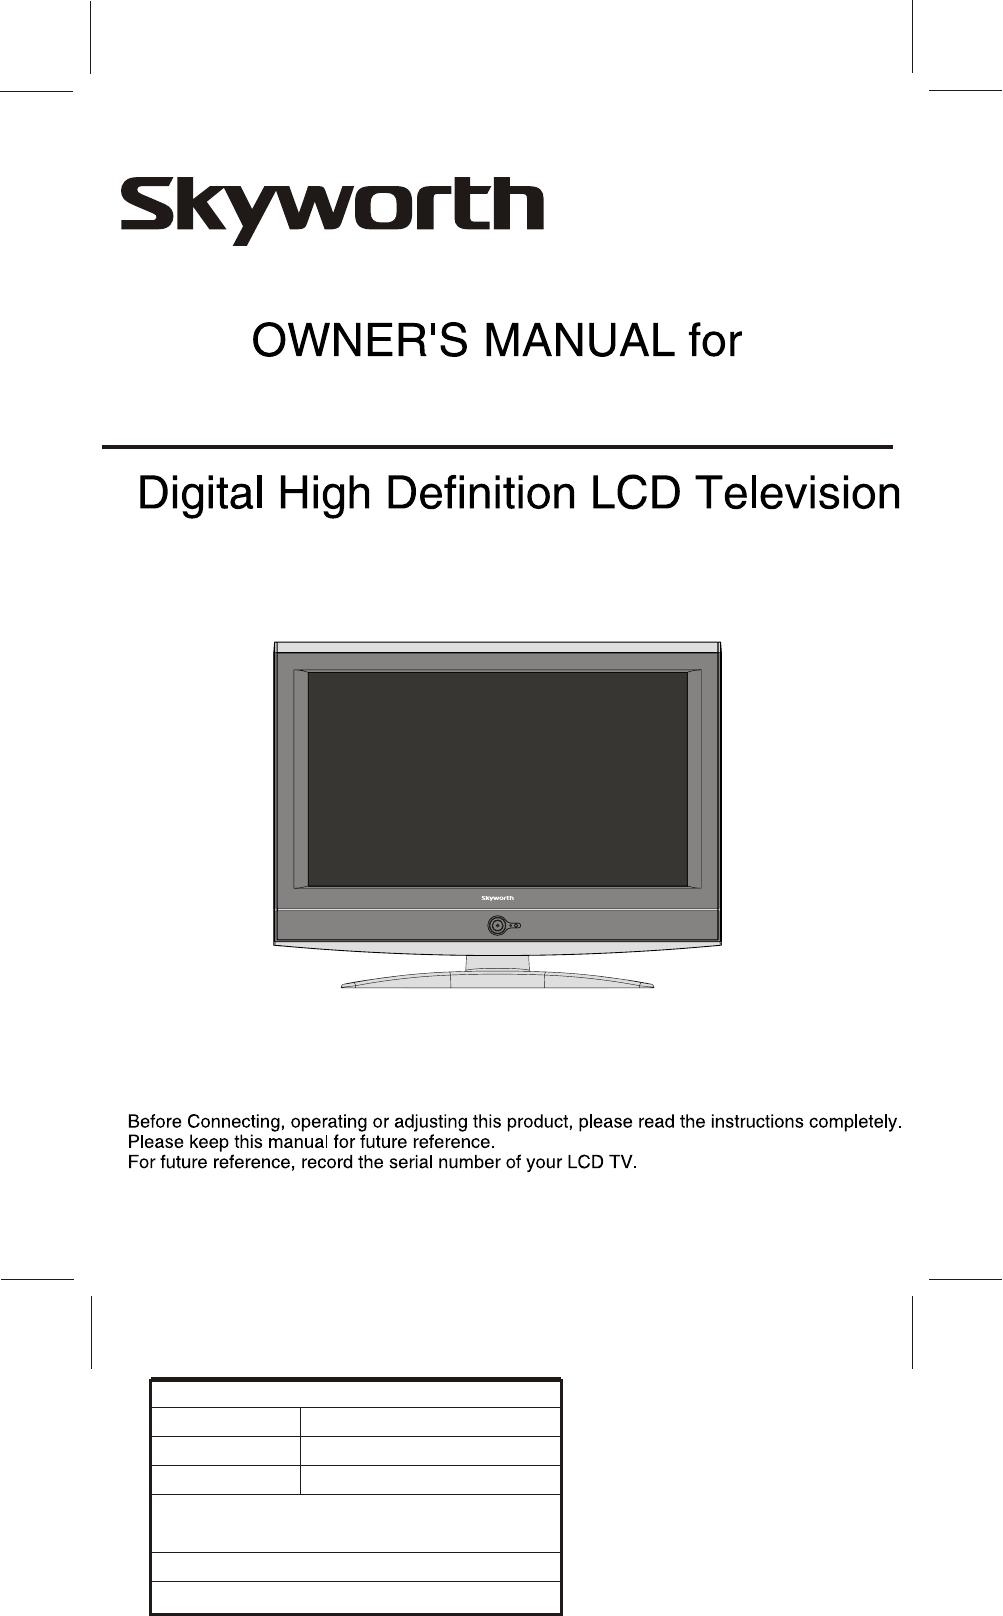 Skyworth Sltv 2632A 2 Users Manual 86085M MANUAL(ENG)